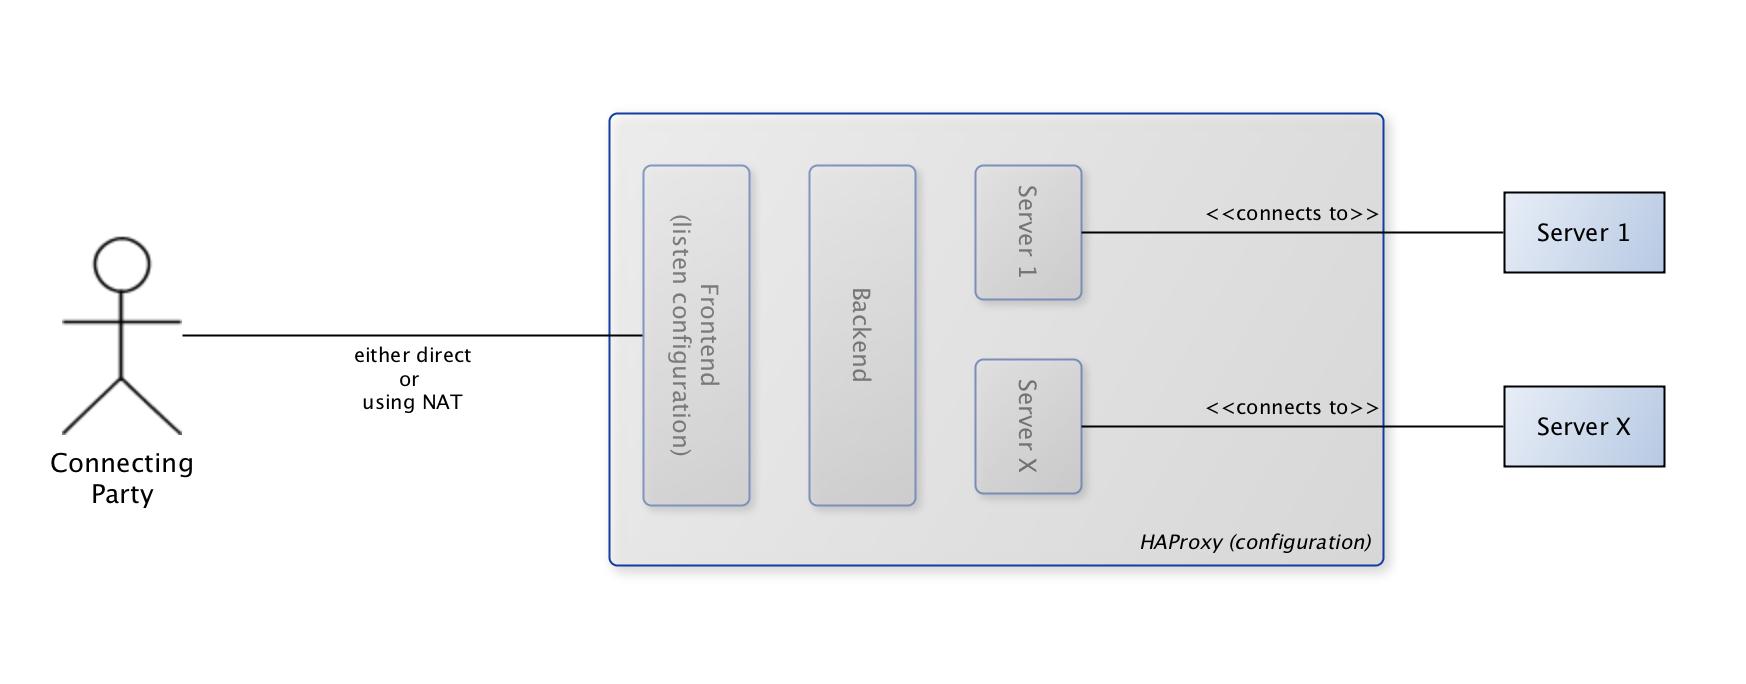 net/haproxy: improve GUI usability · Issue #208 · opnsense/plugins